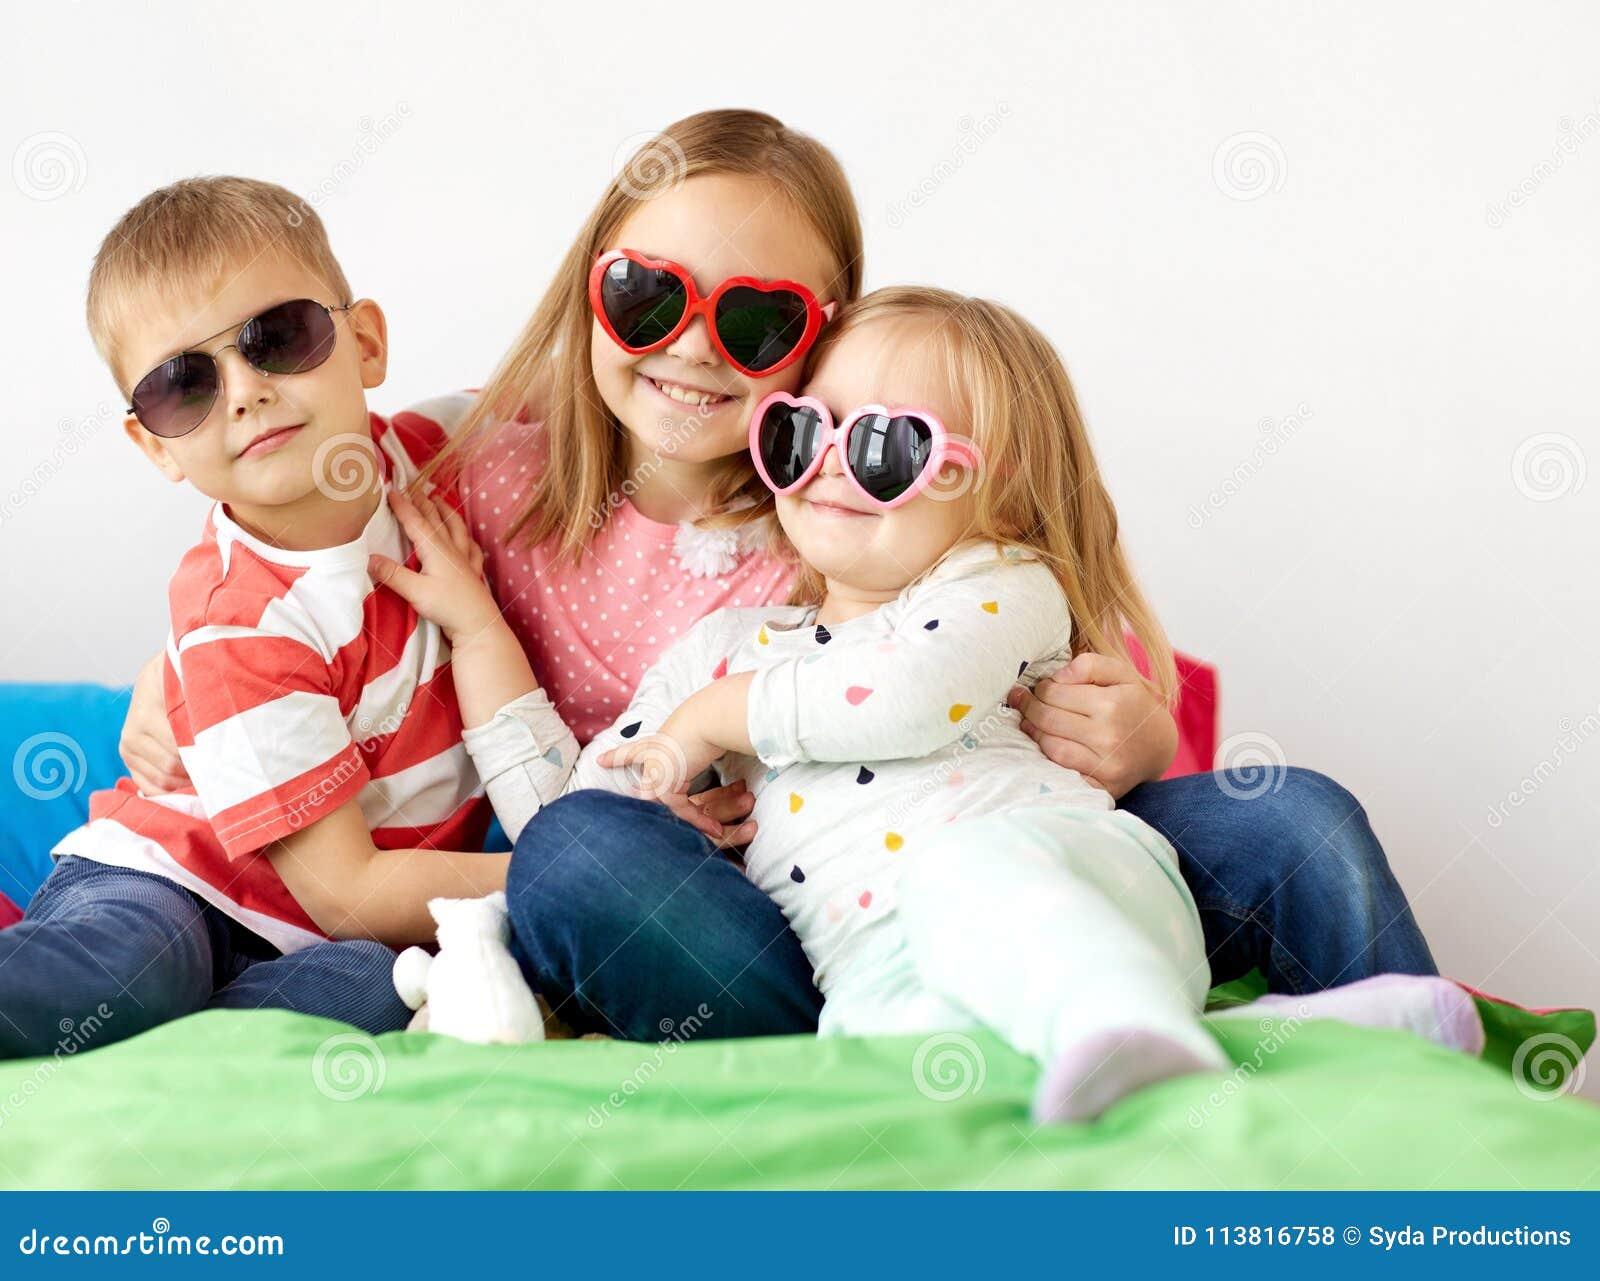 e24fcc52b8 Happy Little Kids In Sunglasses At Home Stock Photo - Image of ...